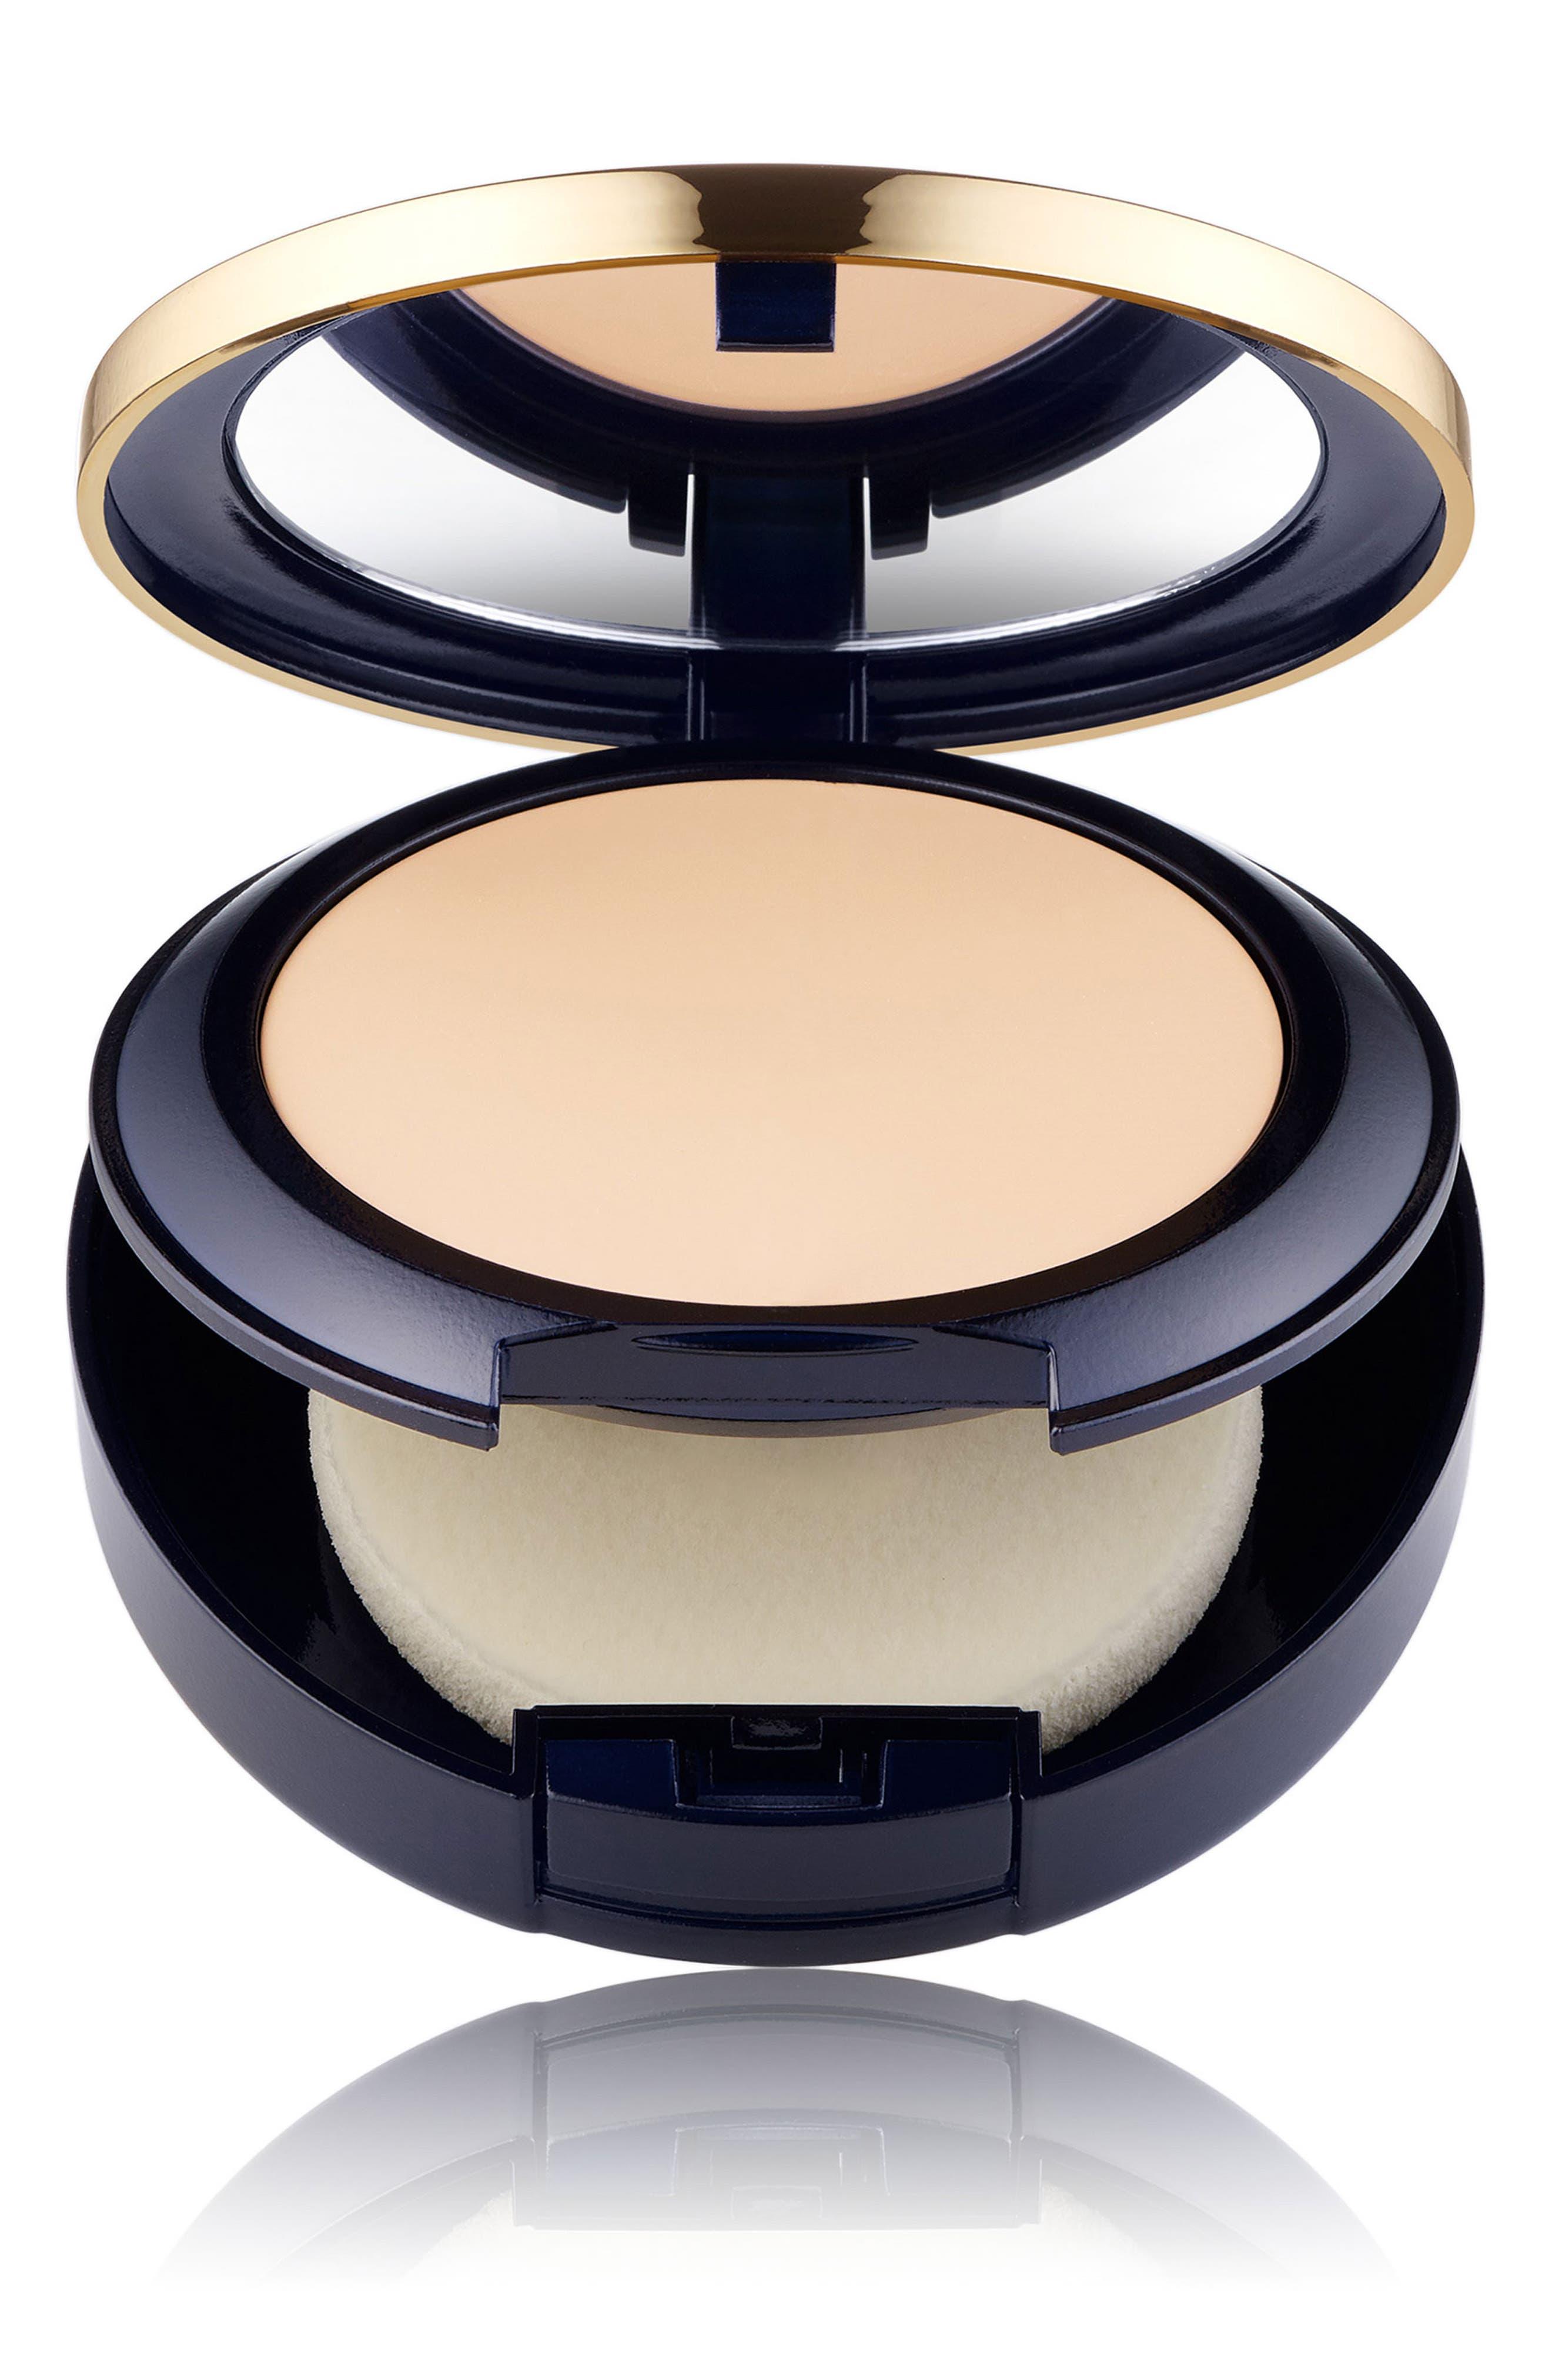 Estee Lauder Double Wear Stay In Place Matte Powder Foundation - 1W2 Sand